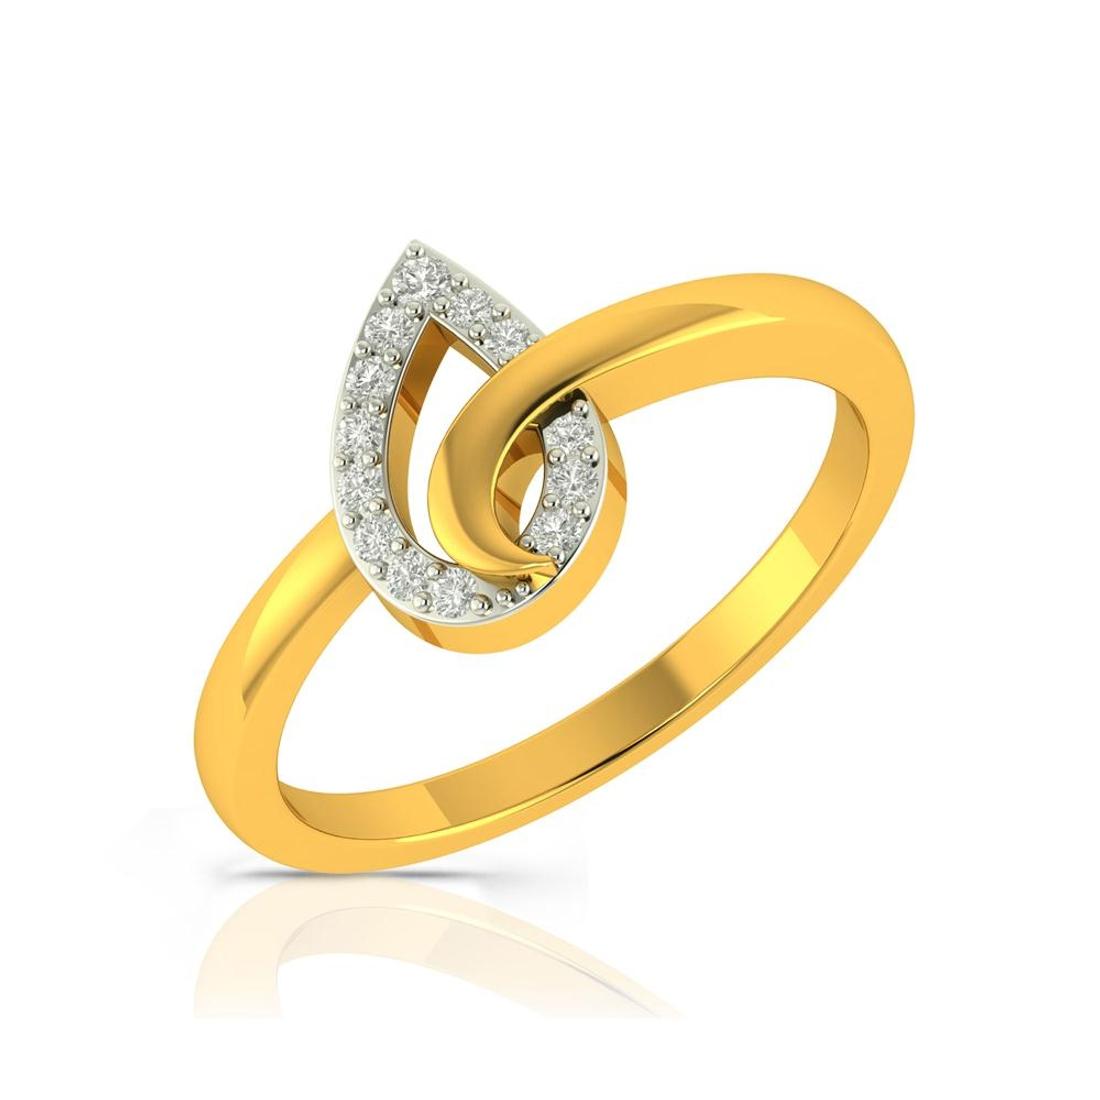 Buy Charu Jewels Diamond Ladies Ring CJLR0362 Online in India